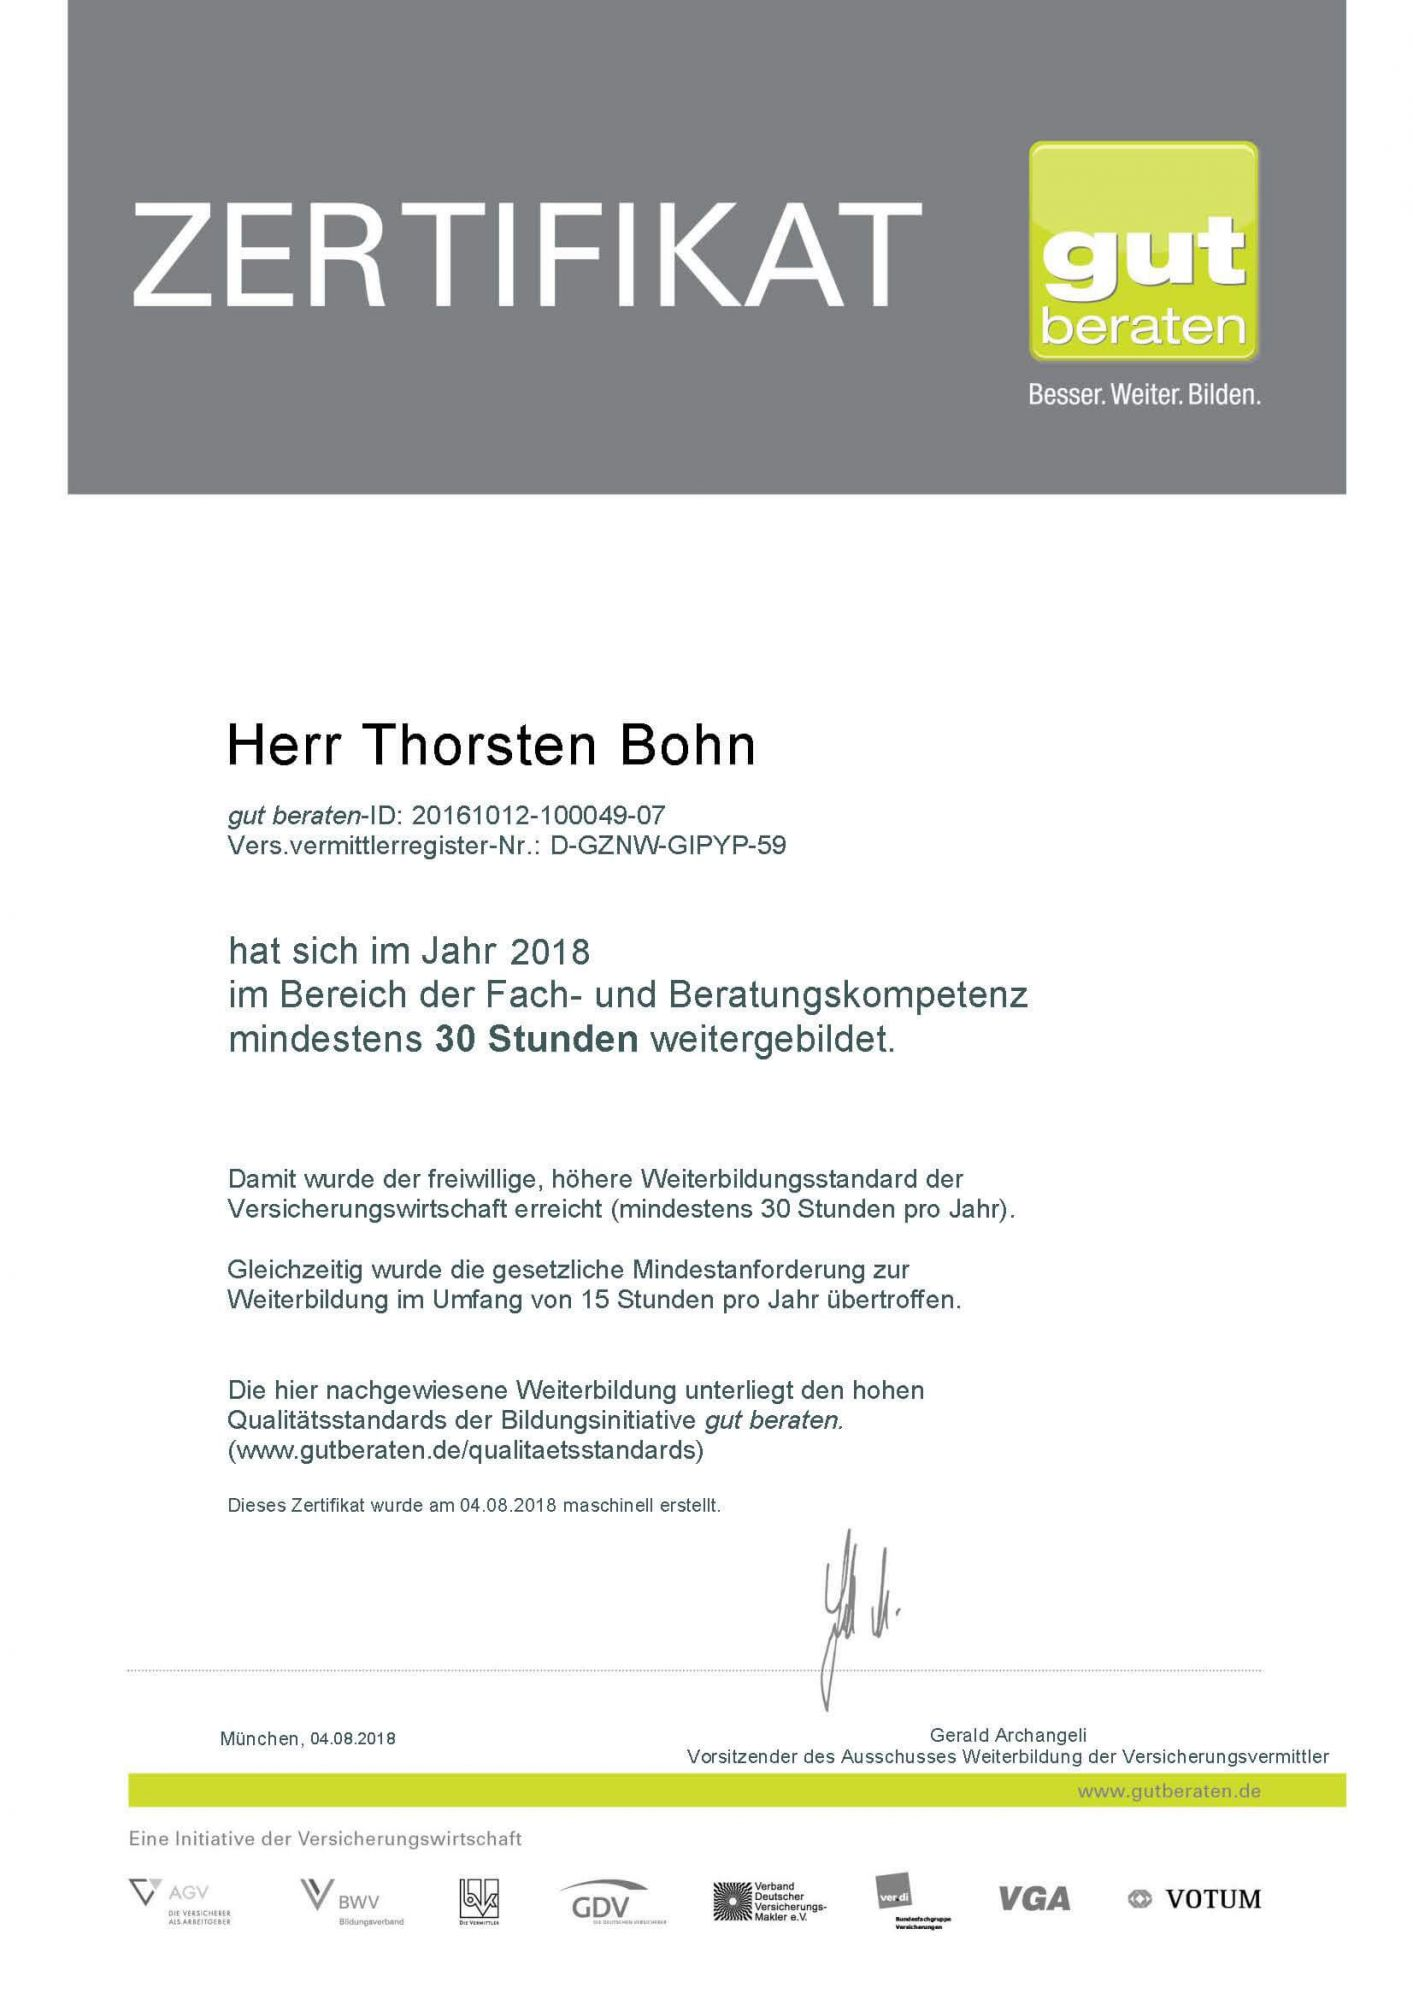 gut beraten Zertifikat 2018